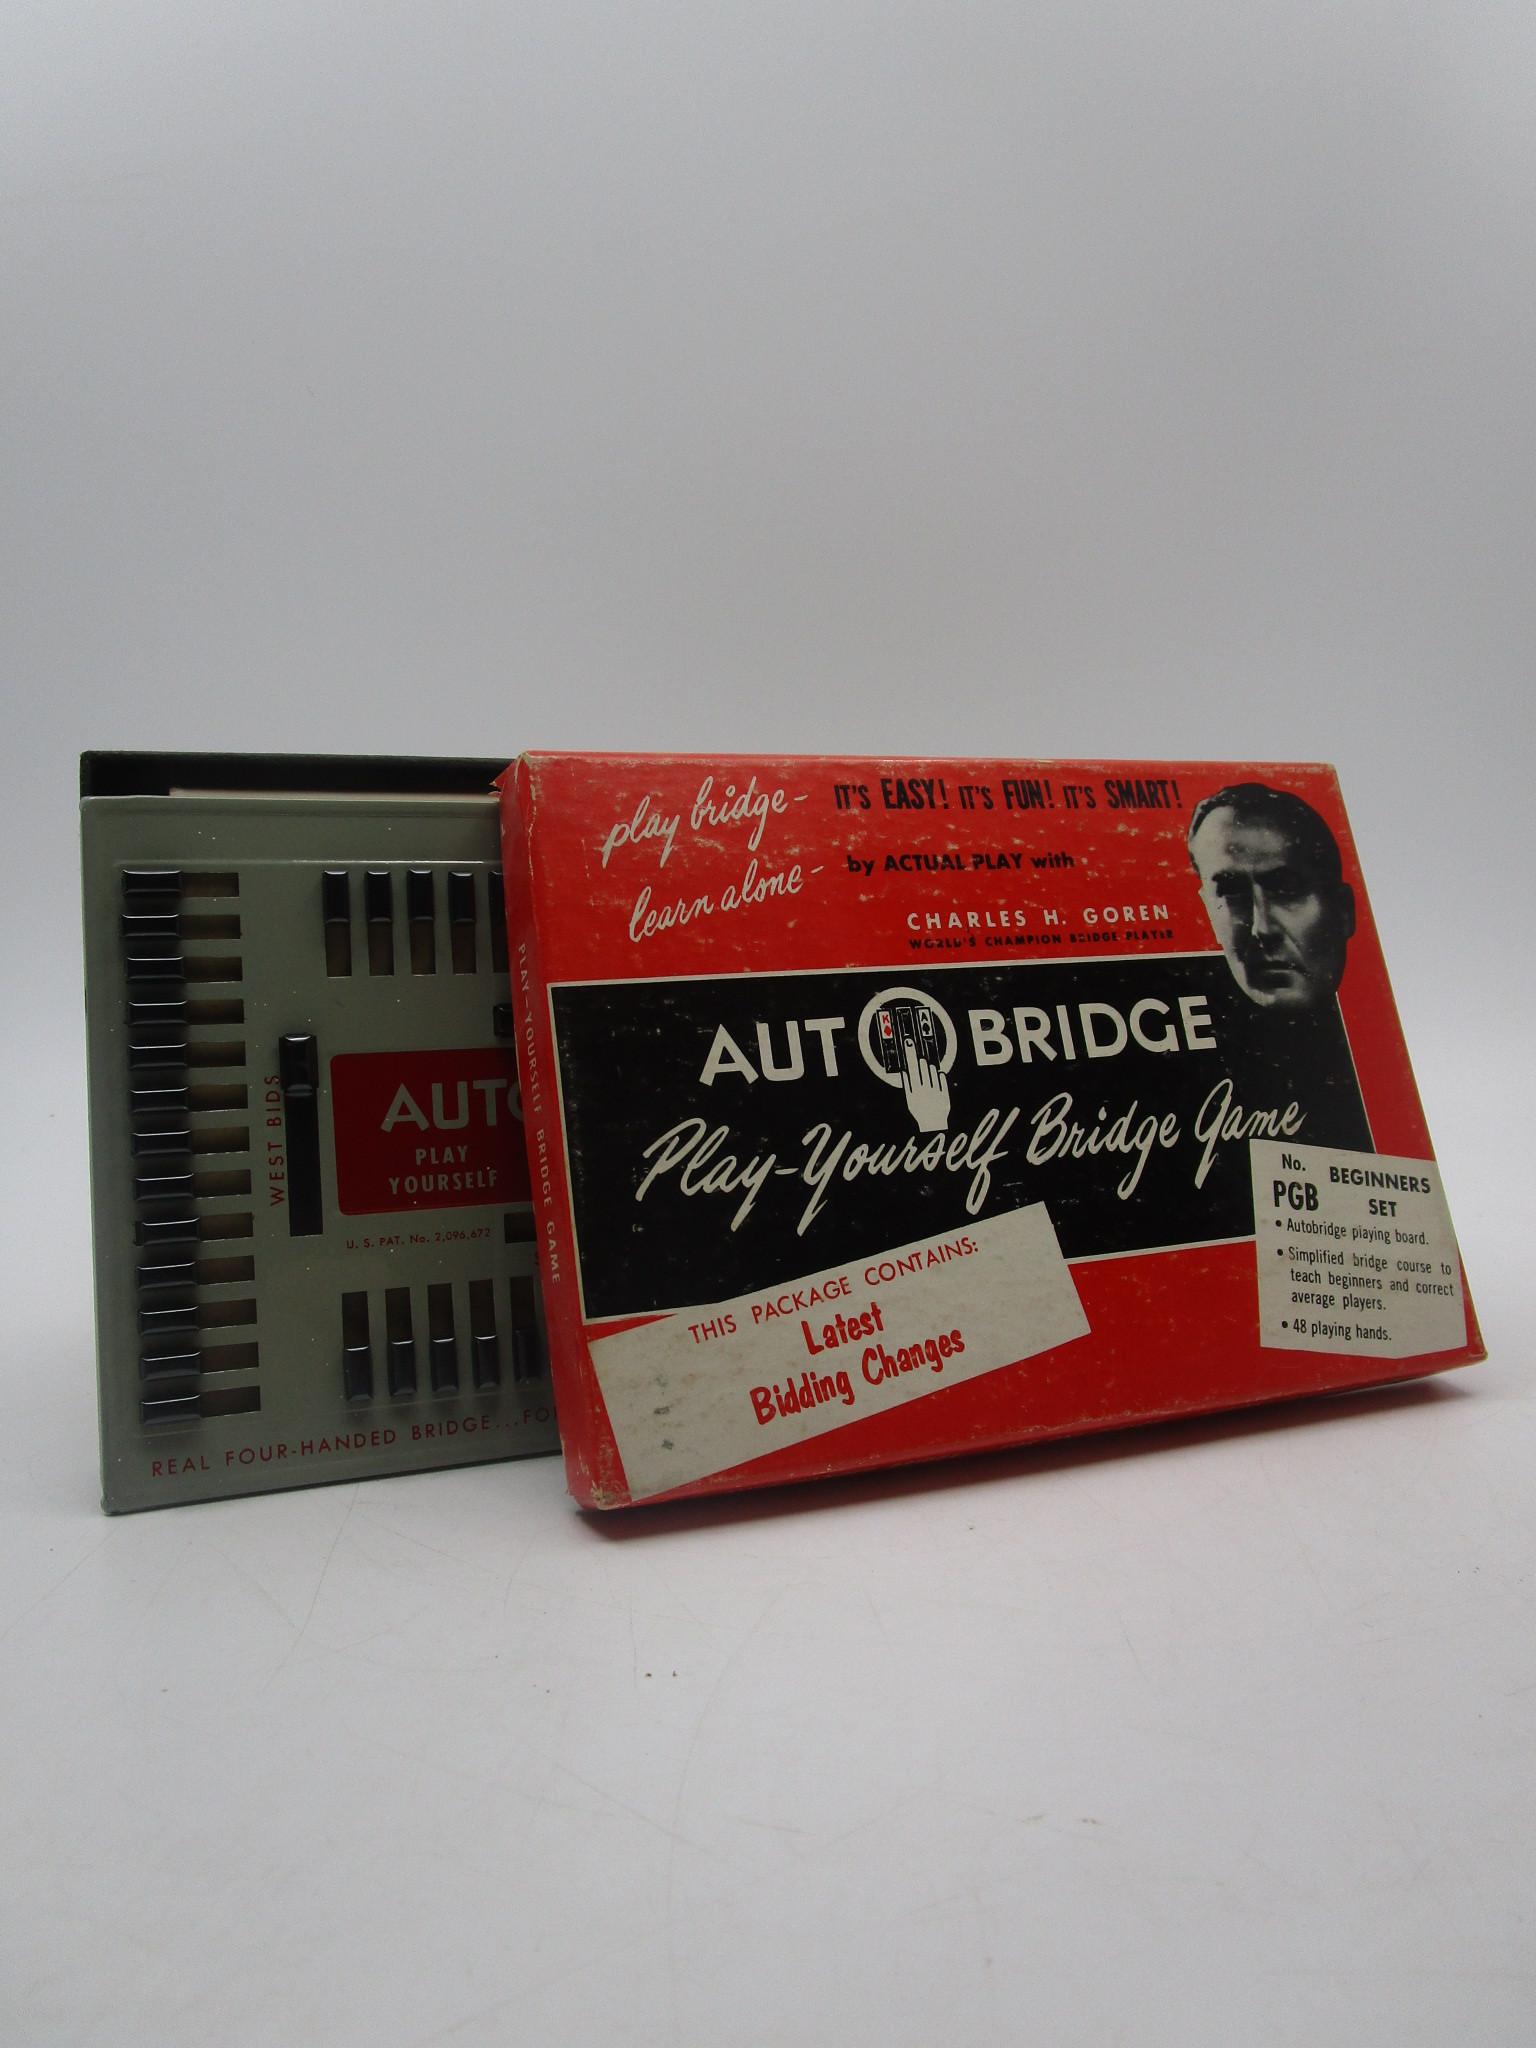 Image for AutoBridge: Play-Yourself Bridge Game